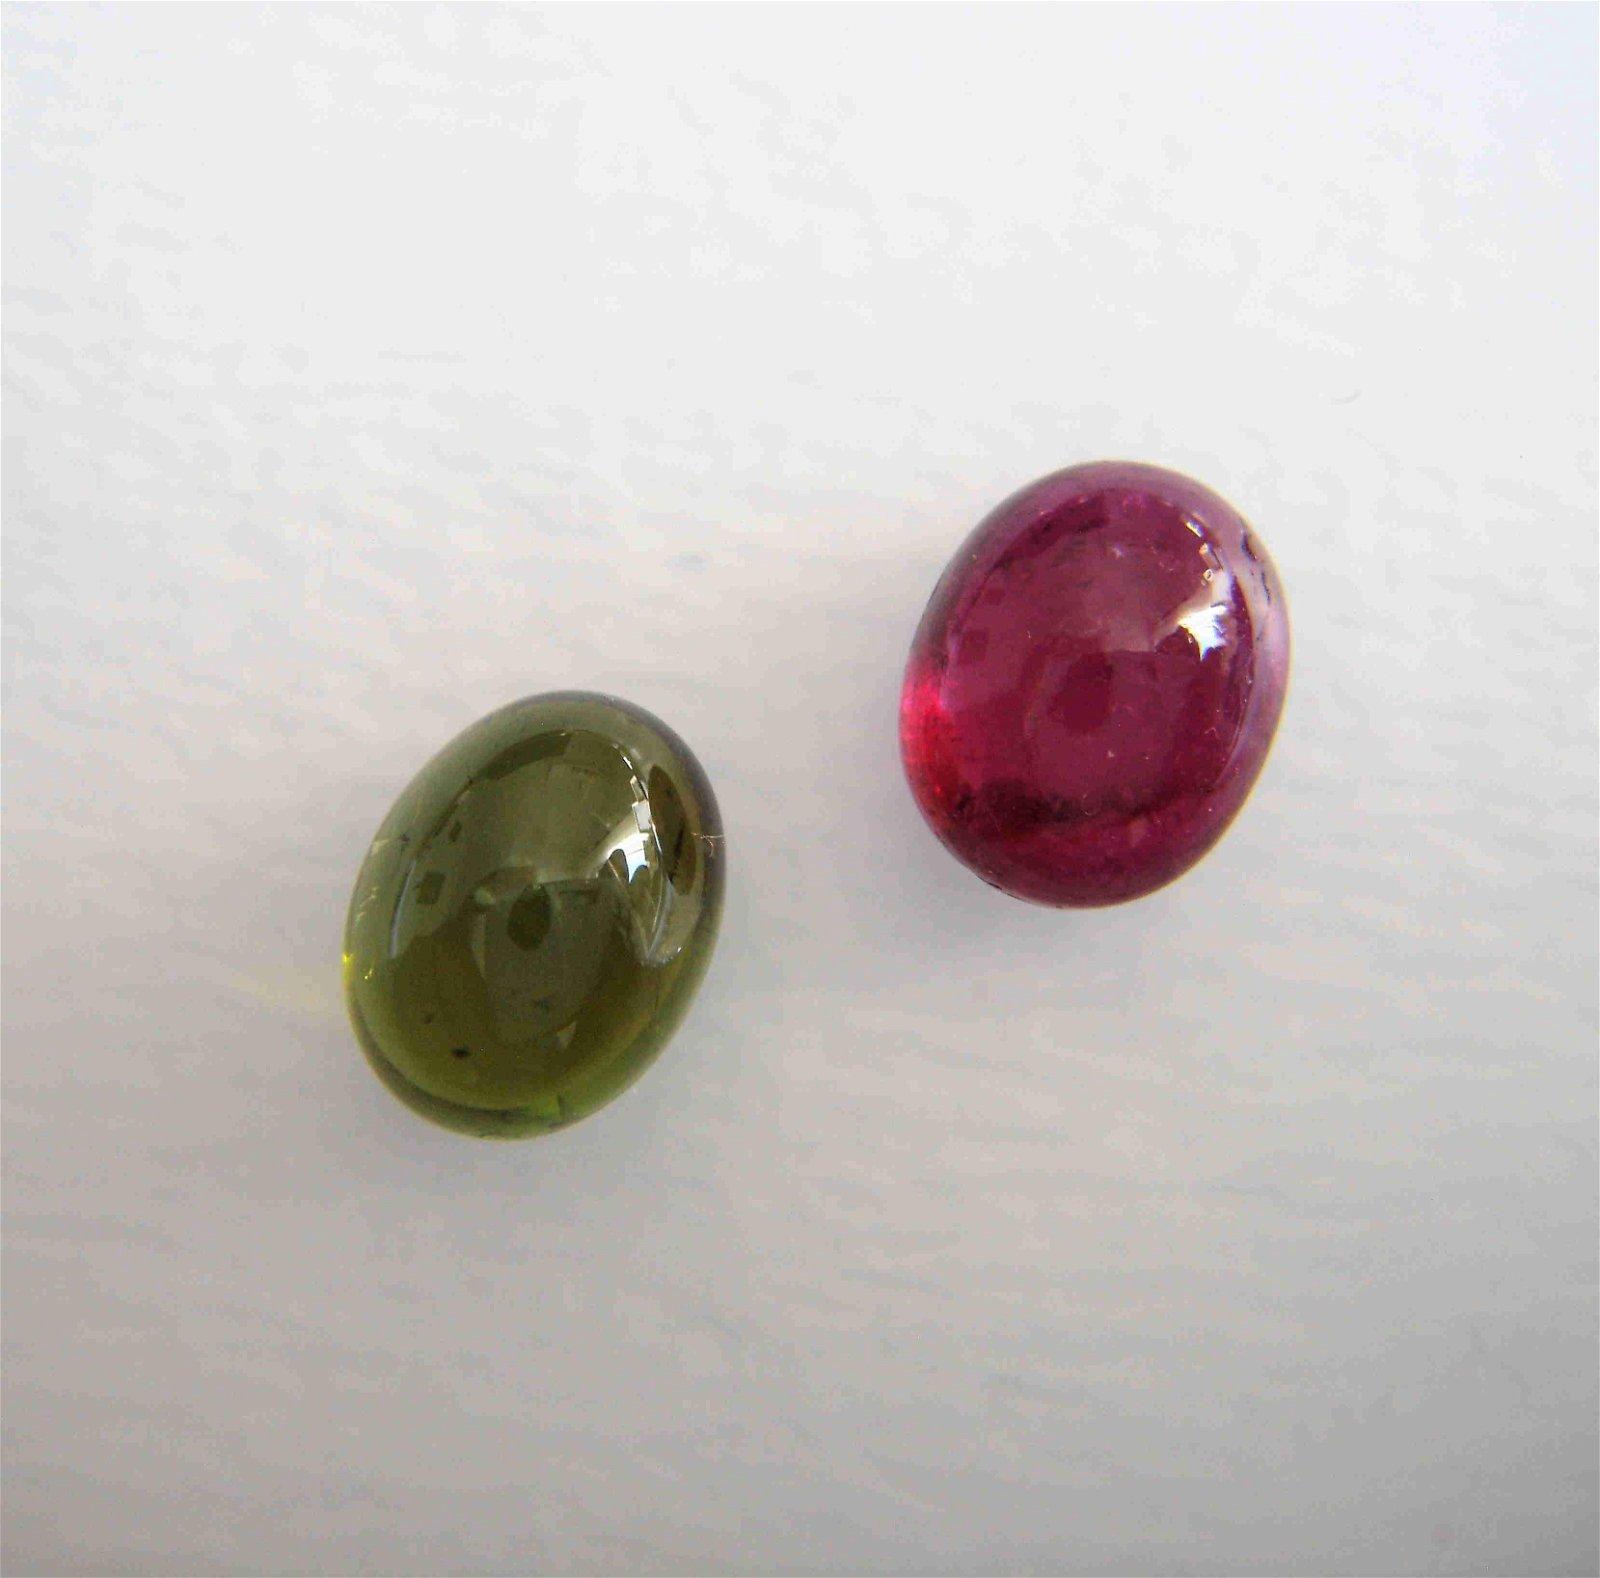 Pink Green Tourmaline Pair - 6.10 ct